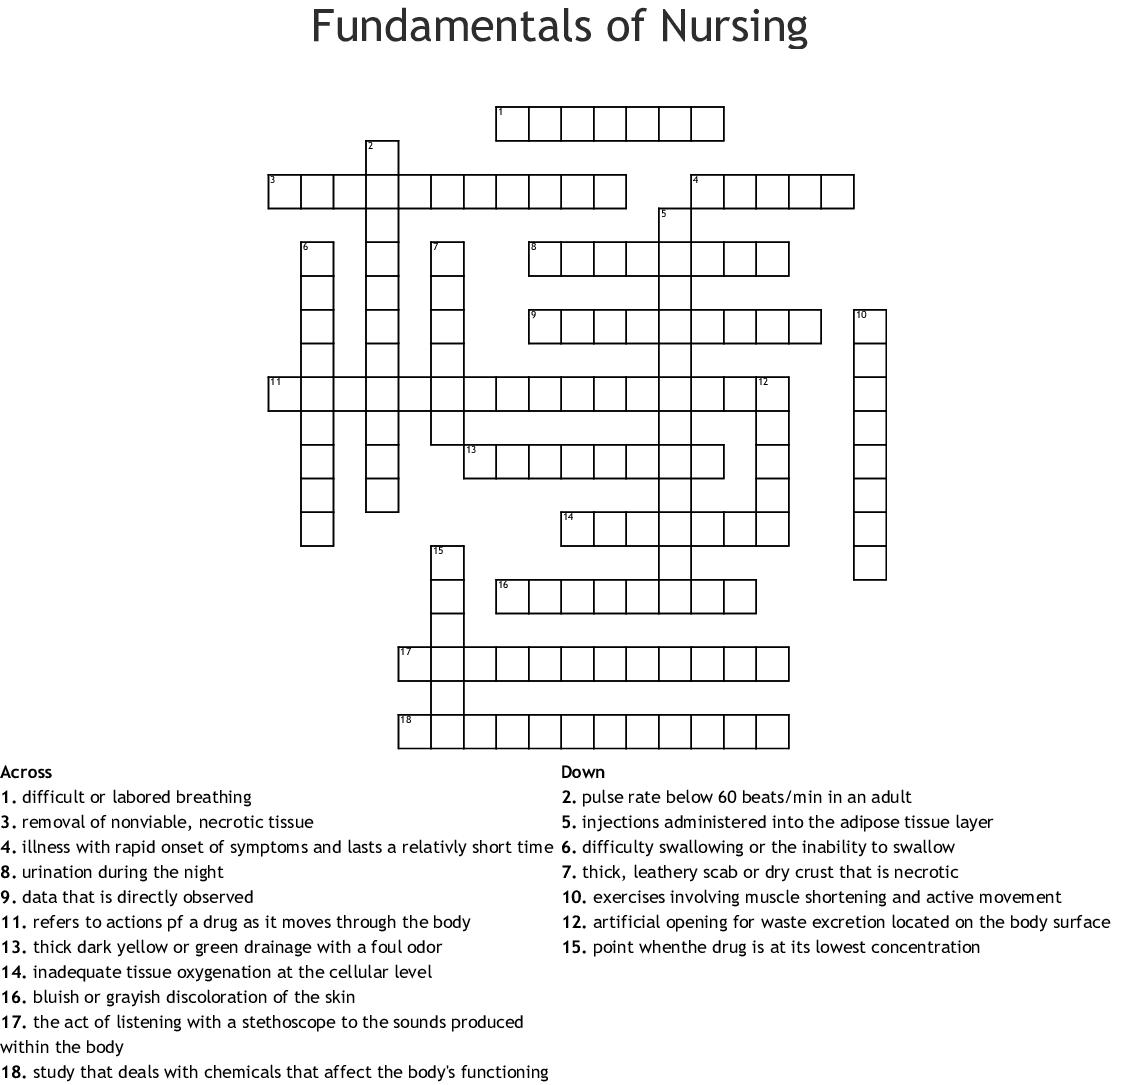 Fundamentals Of Nursing Crossword - Wordmint - Printable Crossword Puzzles For Nurses